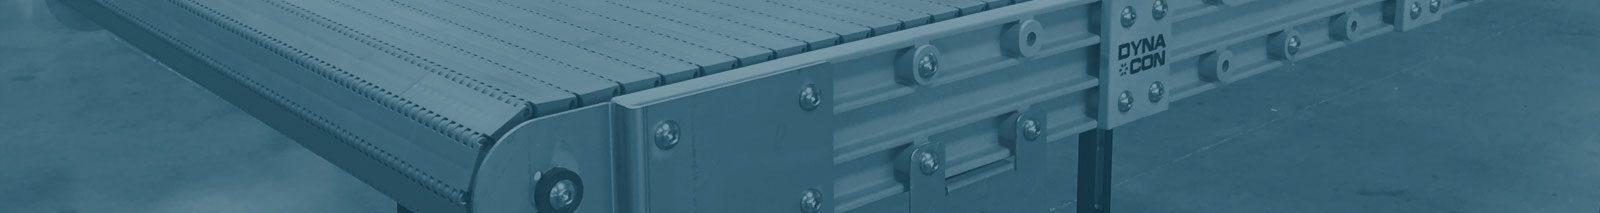 DynaCon Low Profile Conveyor